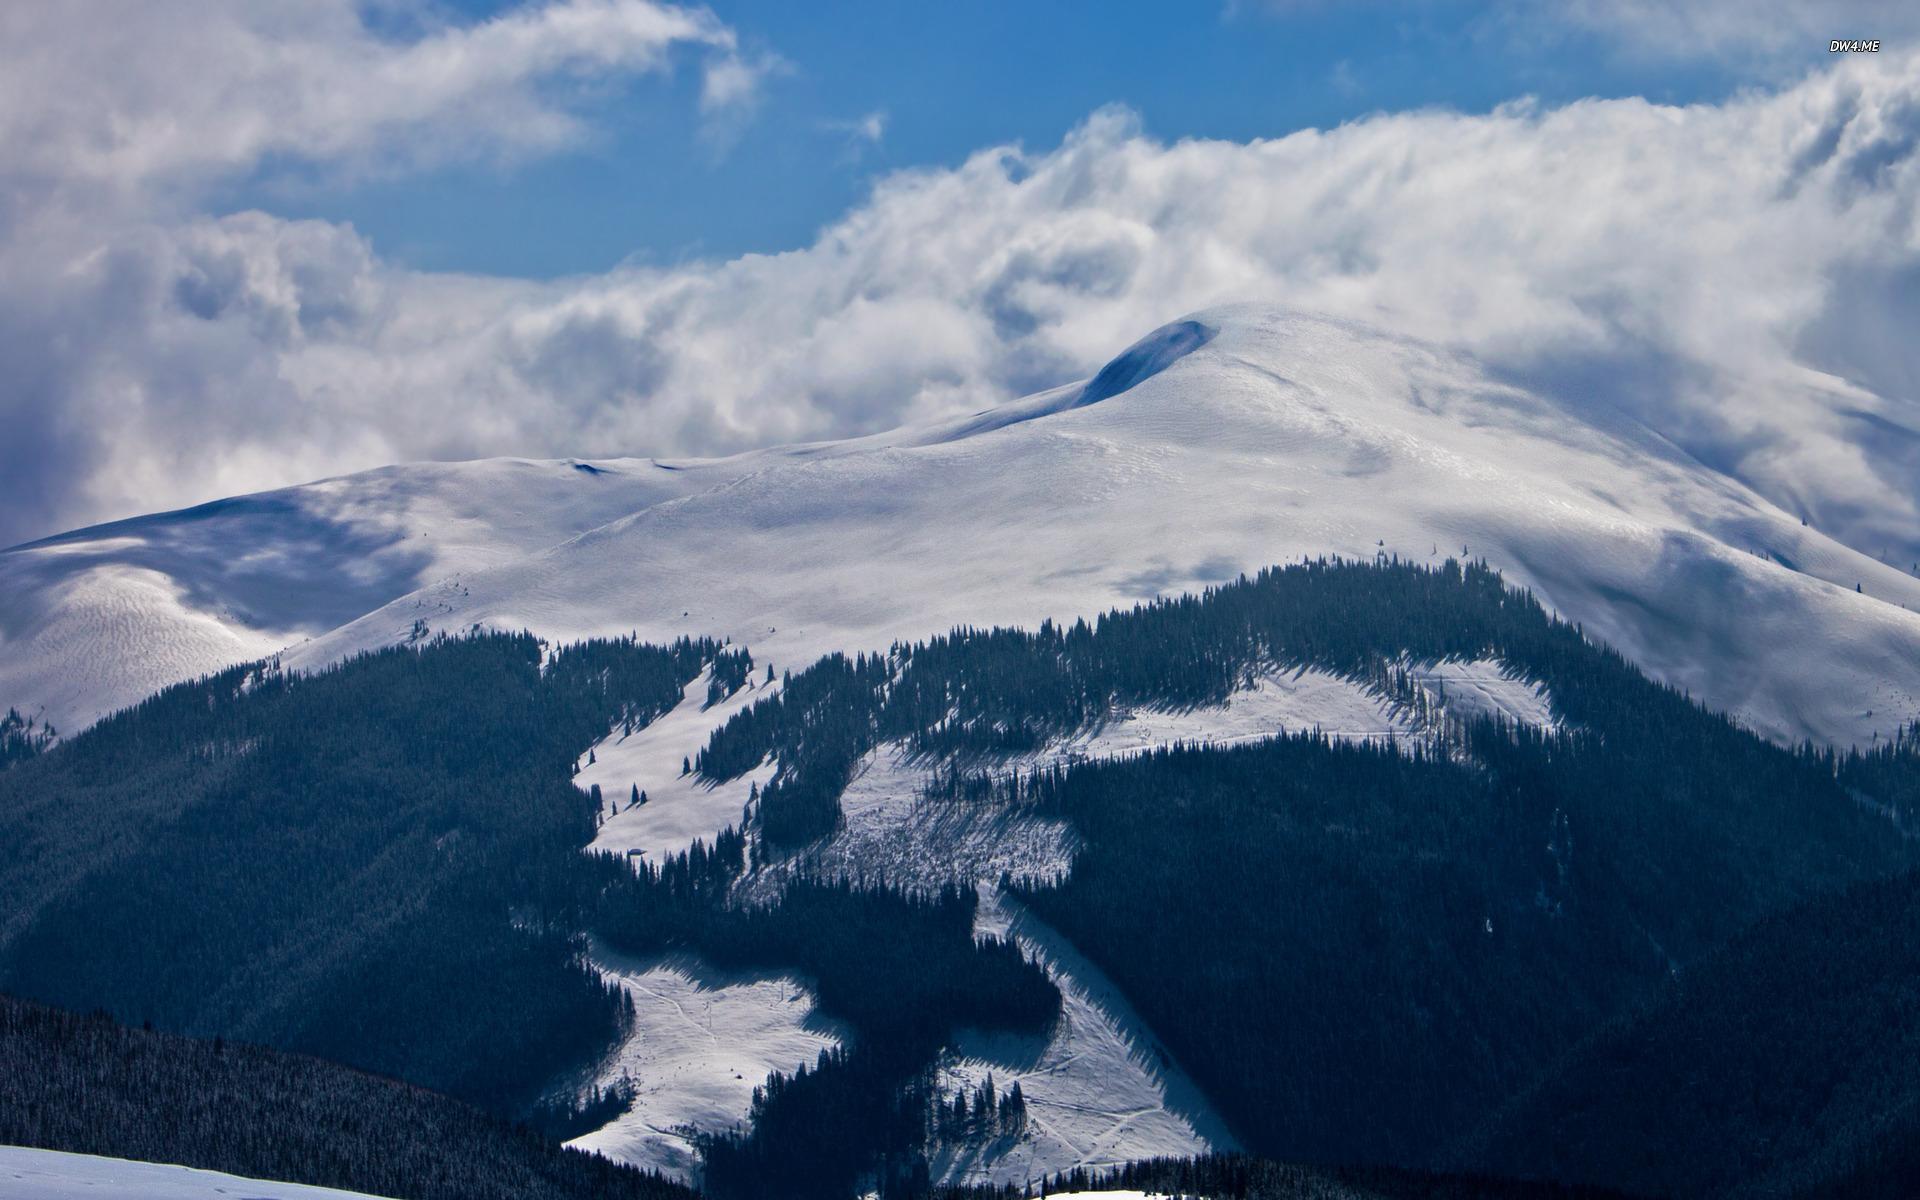 ski resort wallpaper 2560x1600 Transalpina ski resort wallpaper 1920x1200